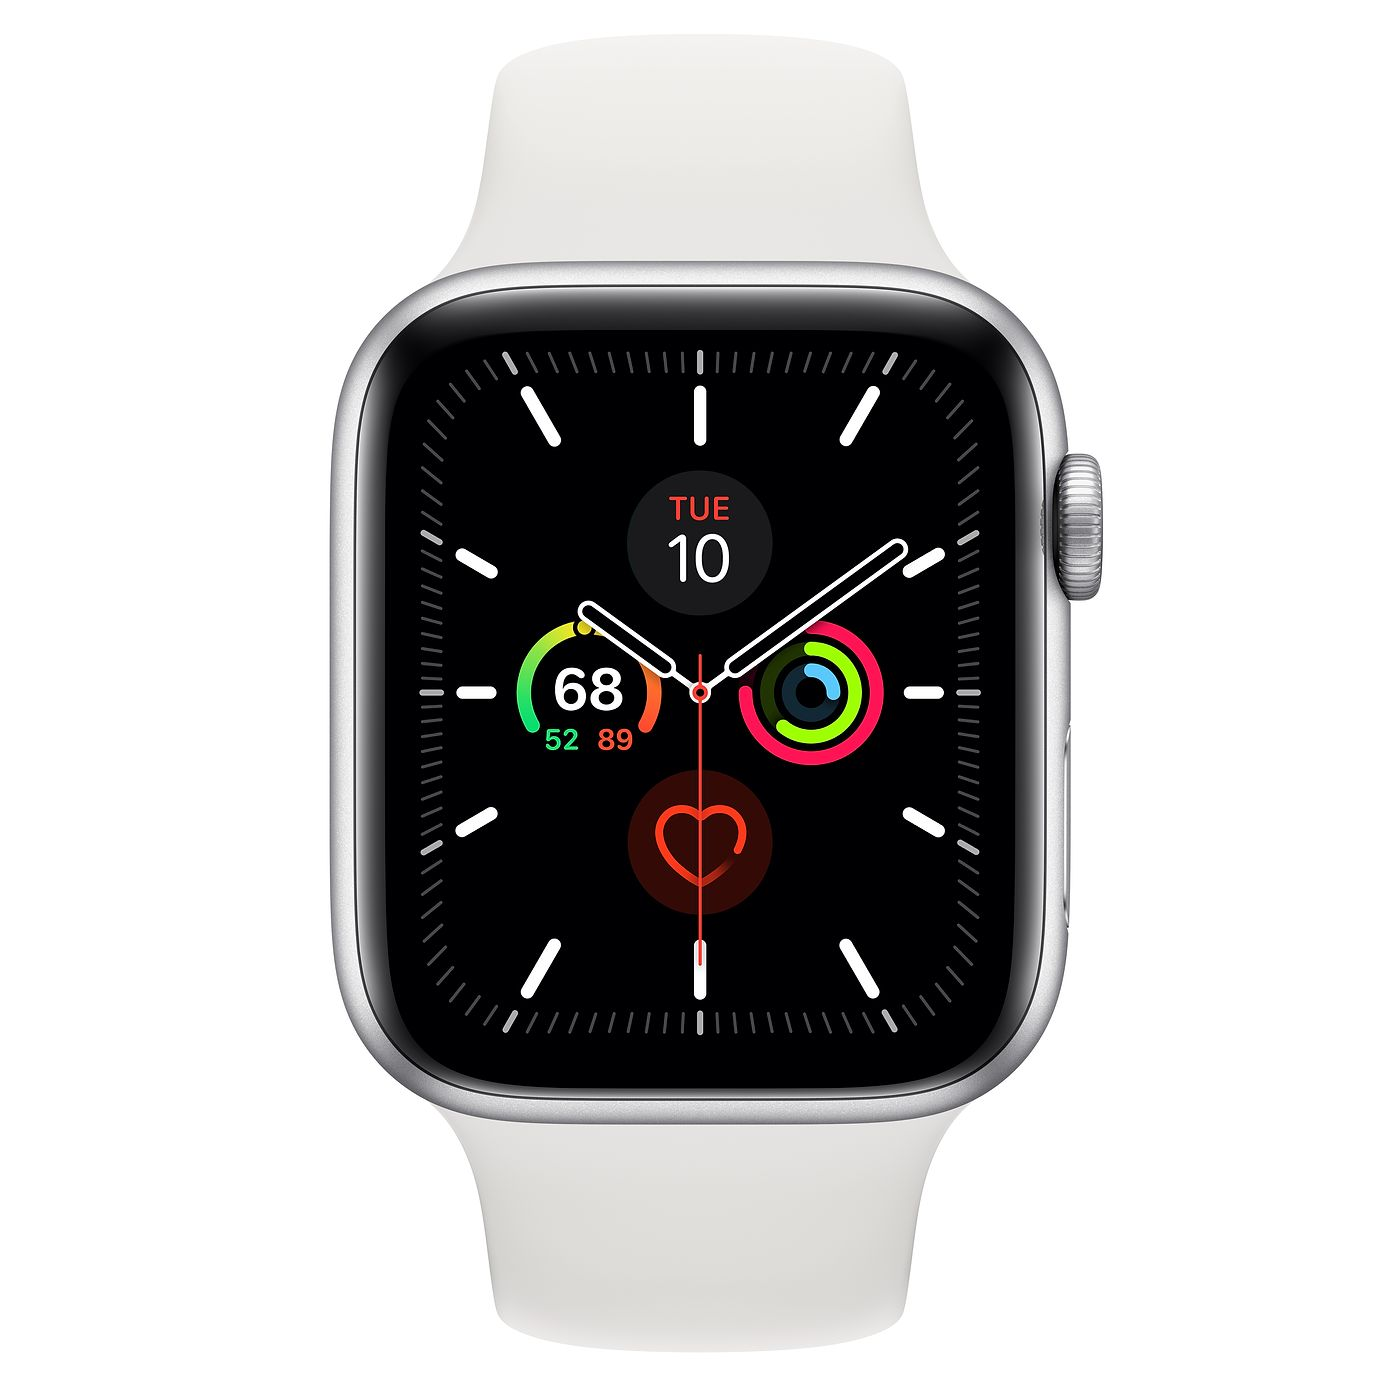 thumbnail 7 - Apple Watch Series 5 (GPS + Cellular) 44mm Smartwatch